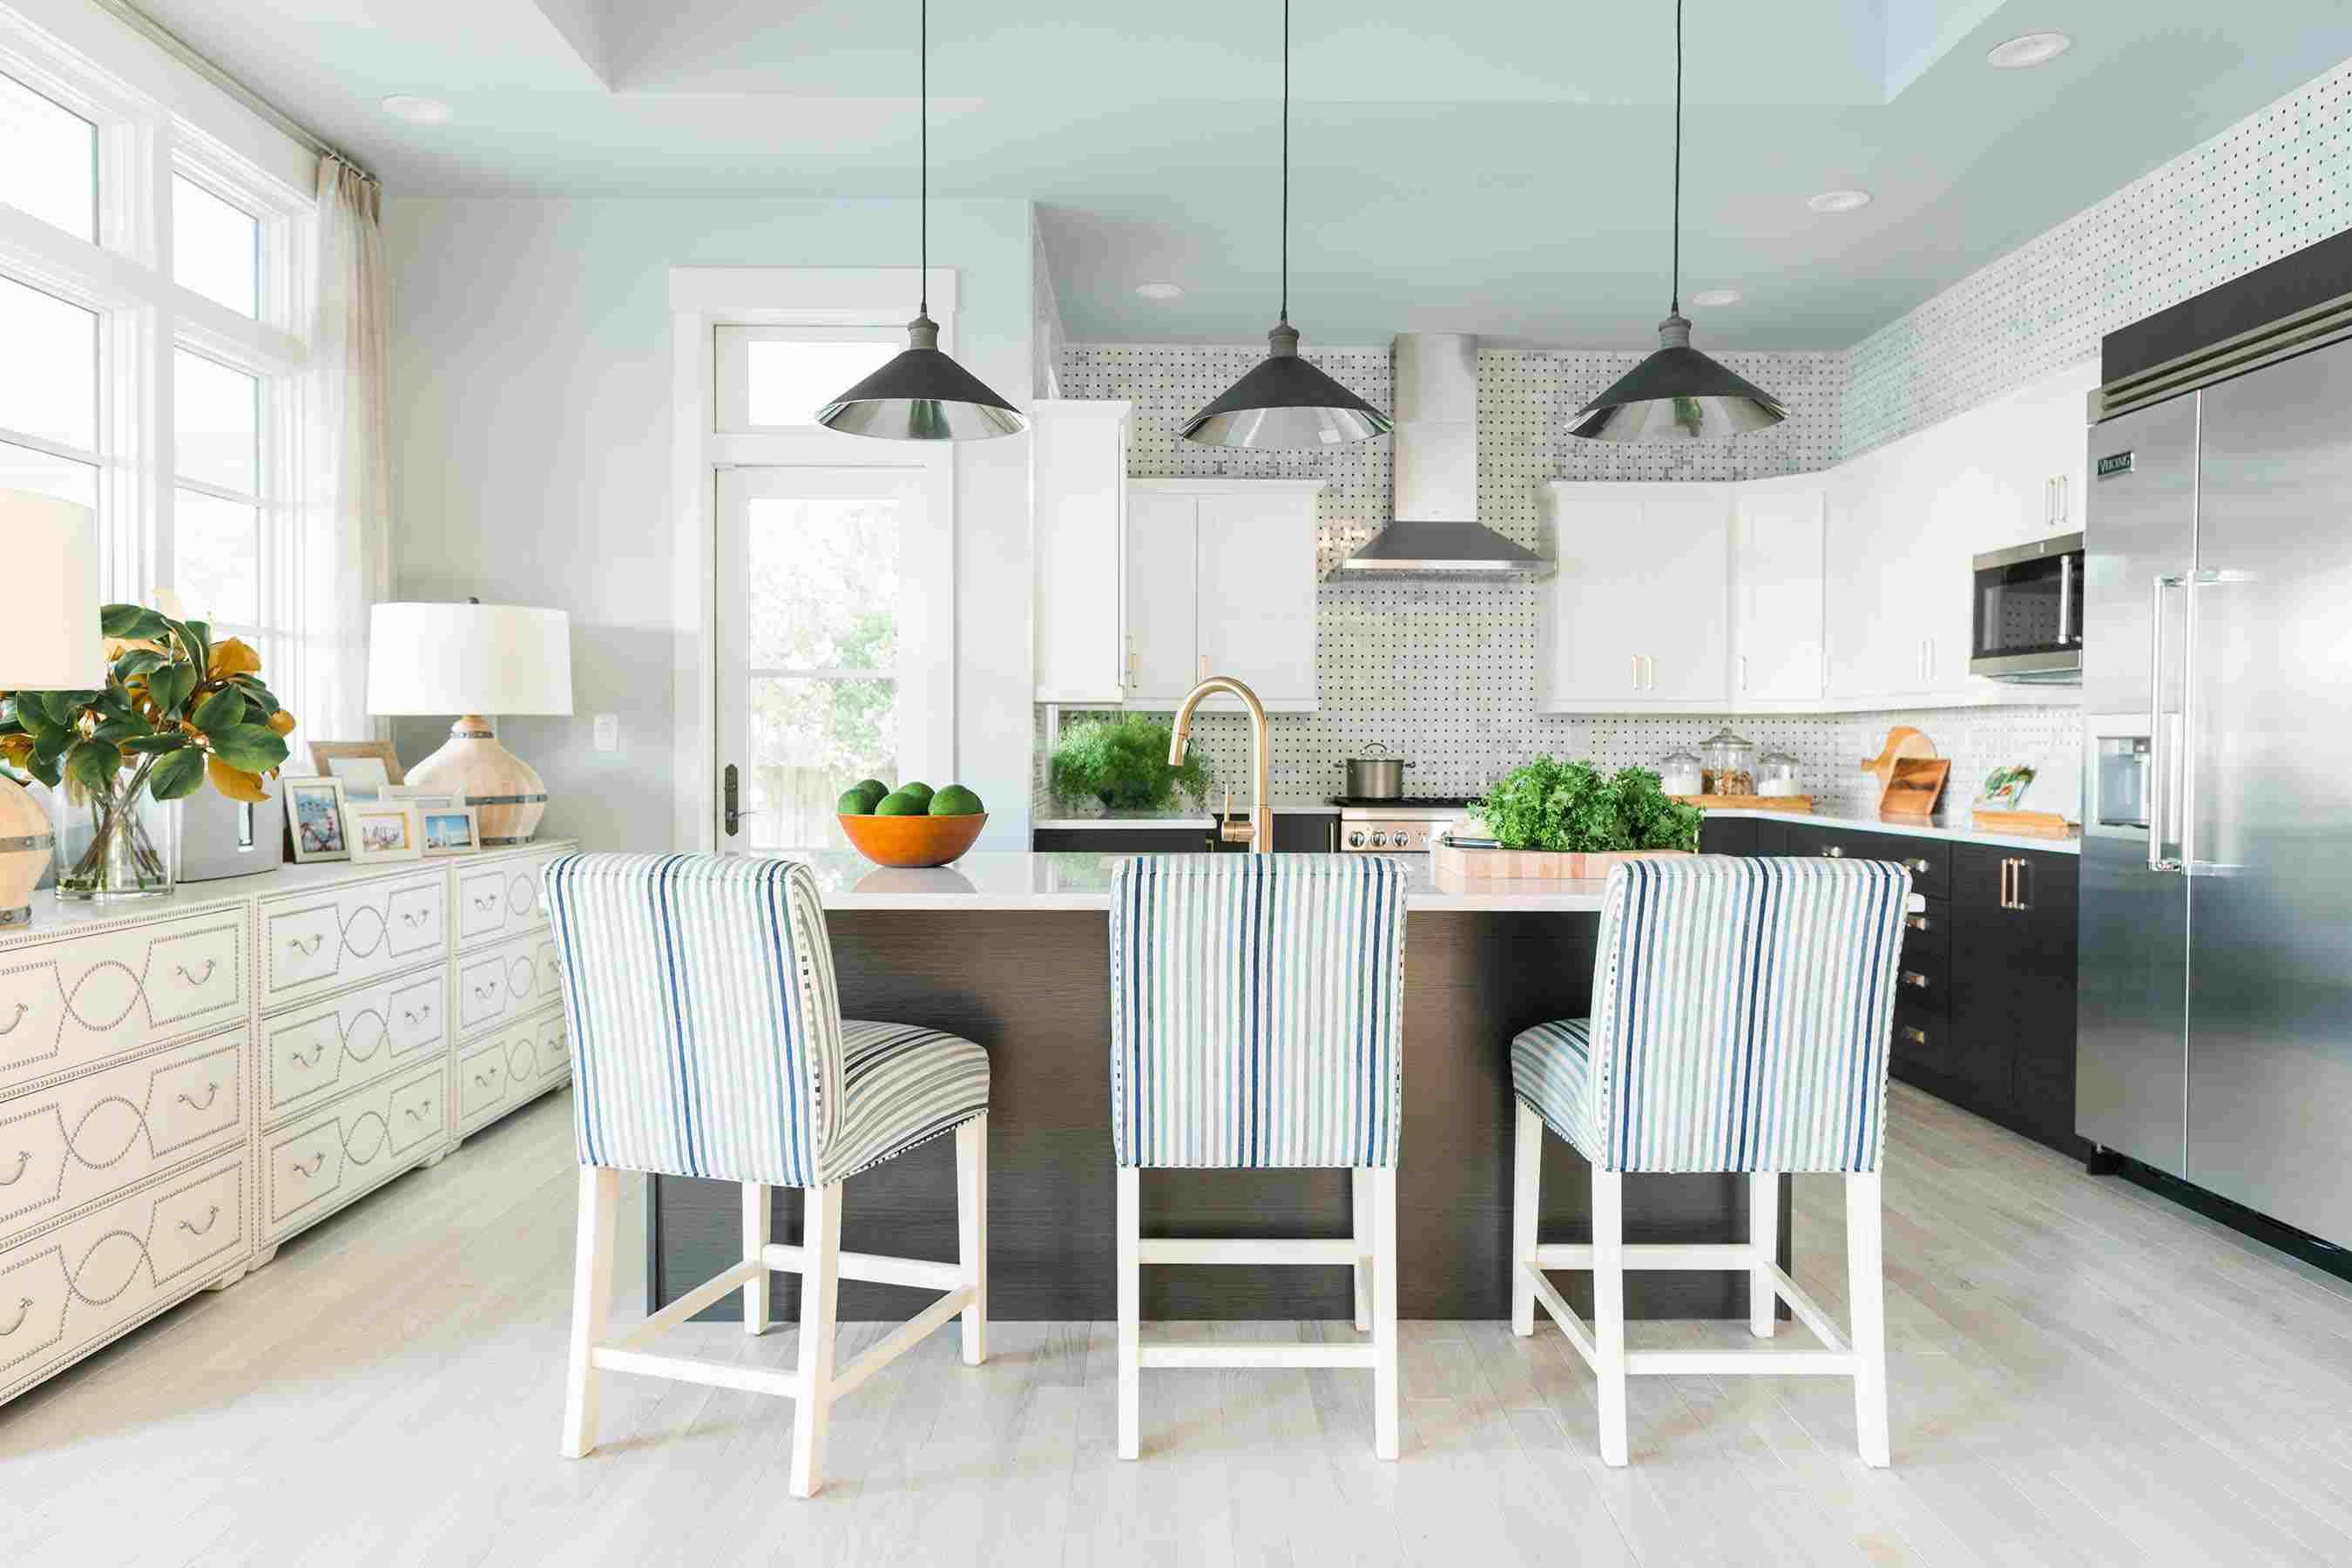 Photo of the 2016 Dream Home's Kitchen